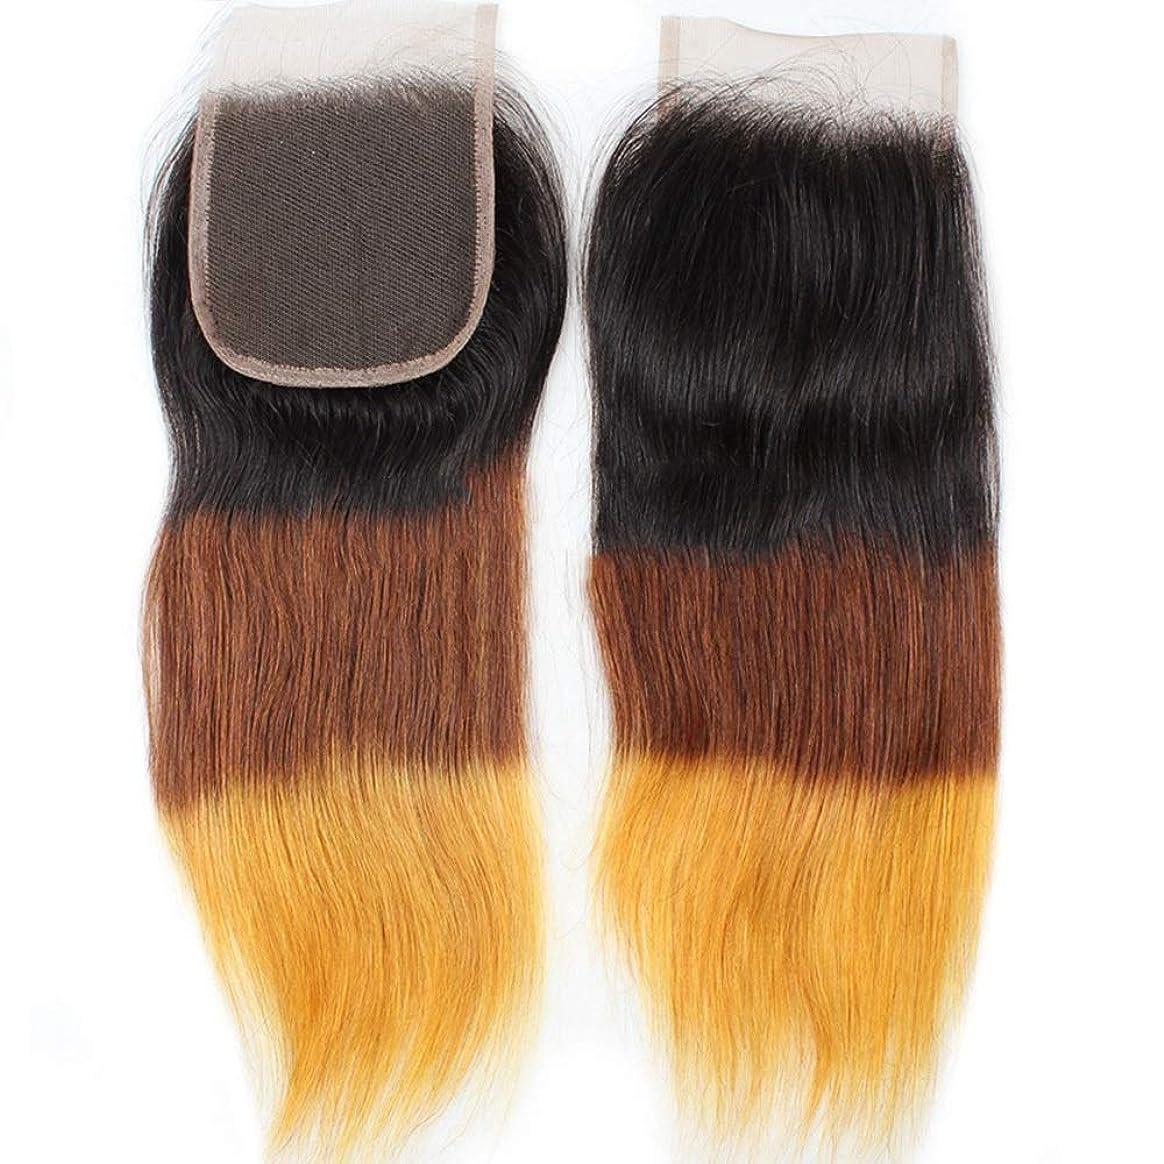 BOBIDYEE 4×4レース前頭閉鎖無料部分耳から耳9Aブラジルストレートヘアグラデーションカラー人間の髪の毛の合成髪レースかつらロールプレイングウィッグロングとショートの女性自然 (色 : ブラウン, サイズ : 16 inch)